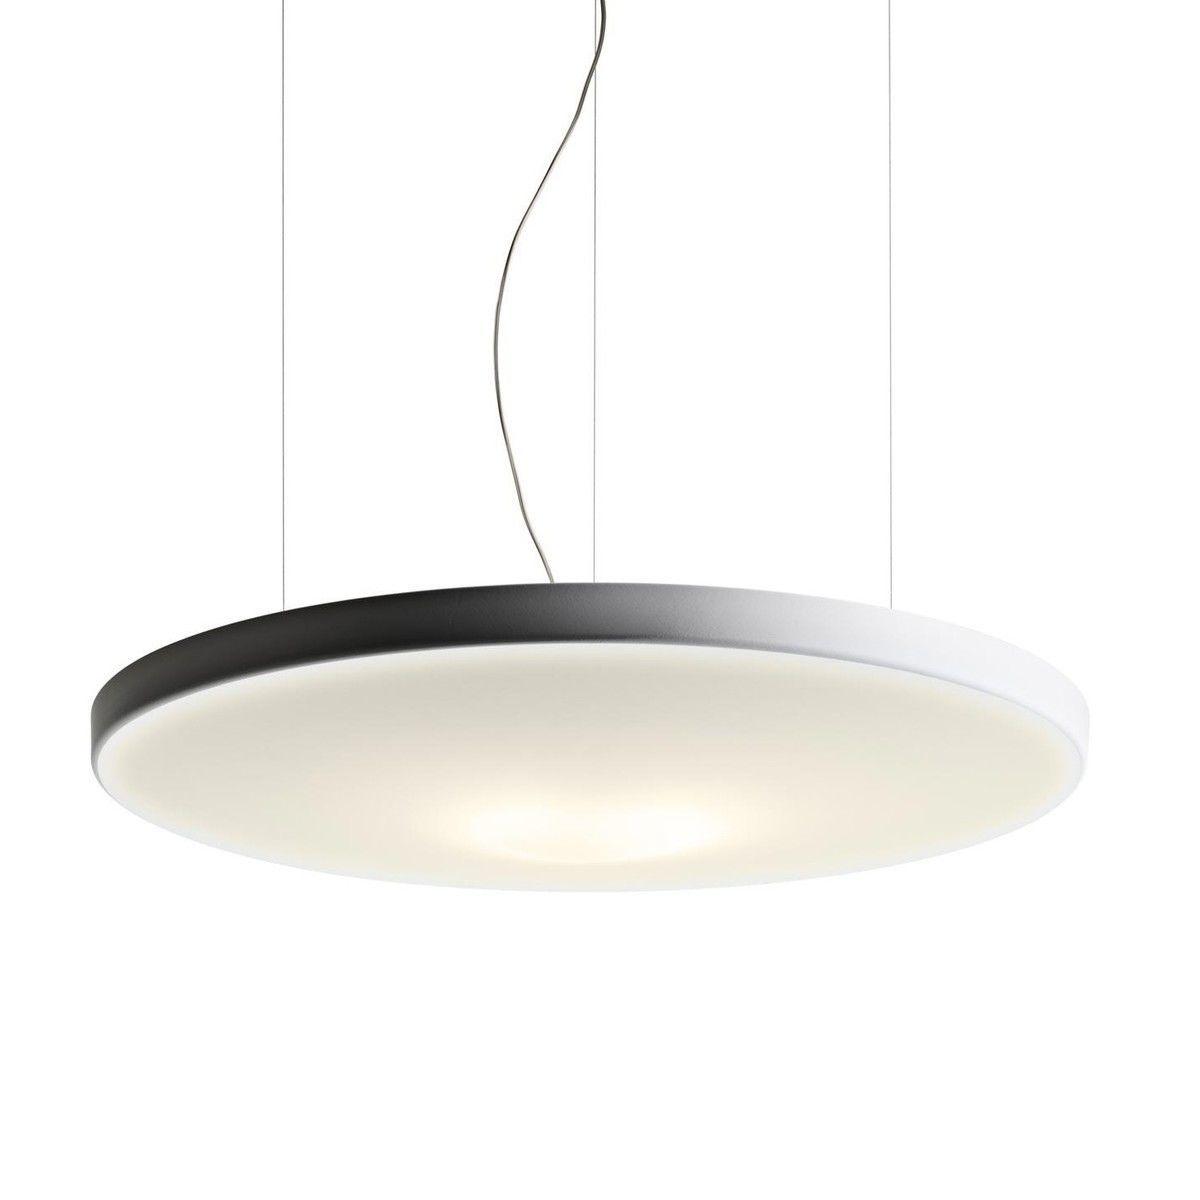 p tale suspension lamp round luceplan. Black Bedroom Furniture Sets. Home Design Ideas